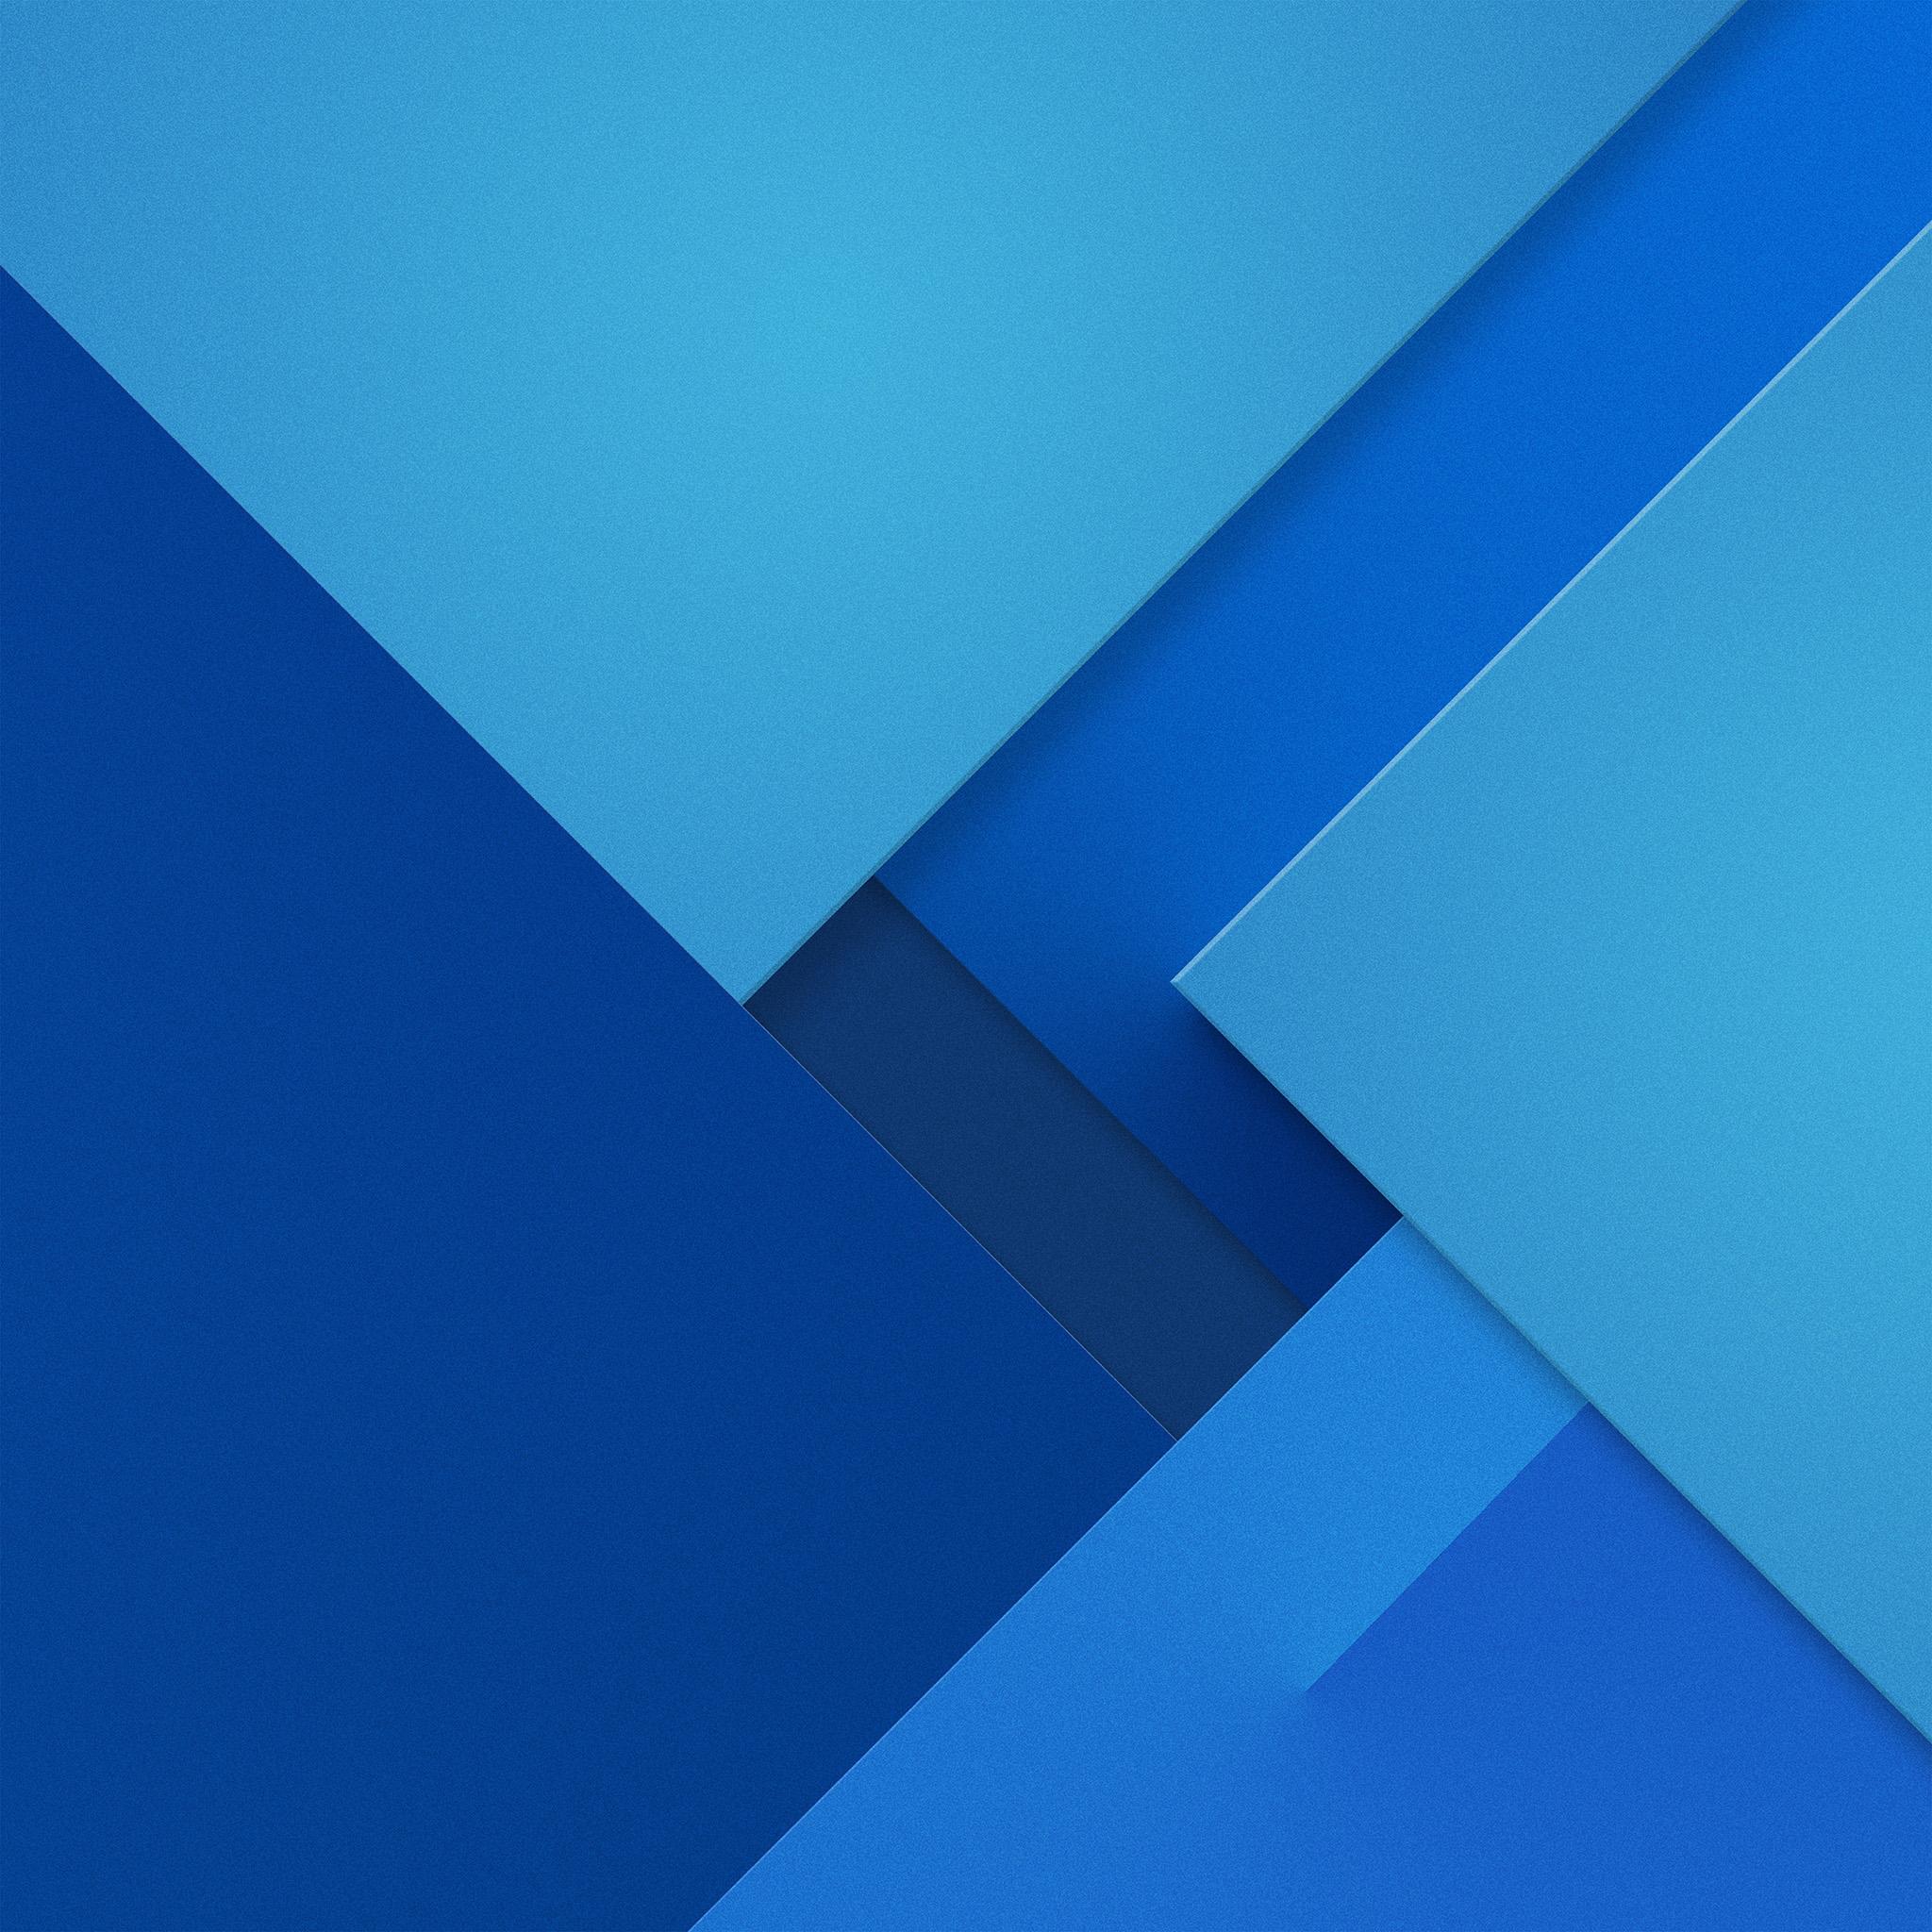 Vo18-samsung-galaxy-7-edge-blue-abstract-pattern-wallpaper